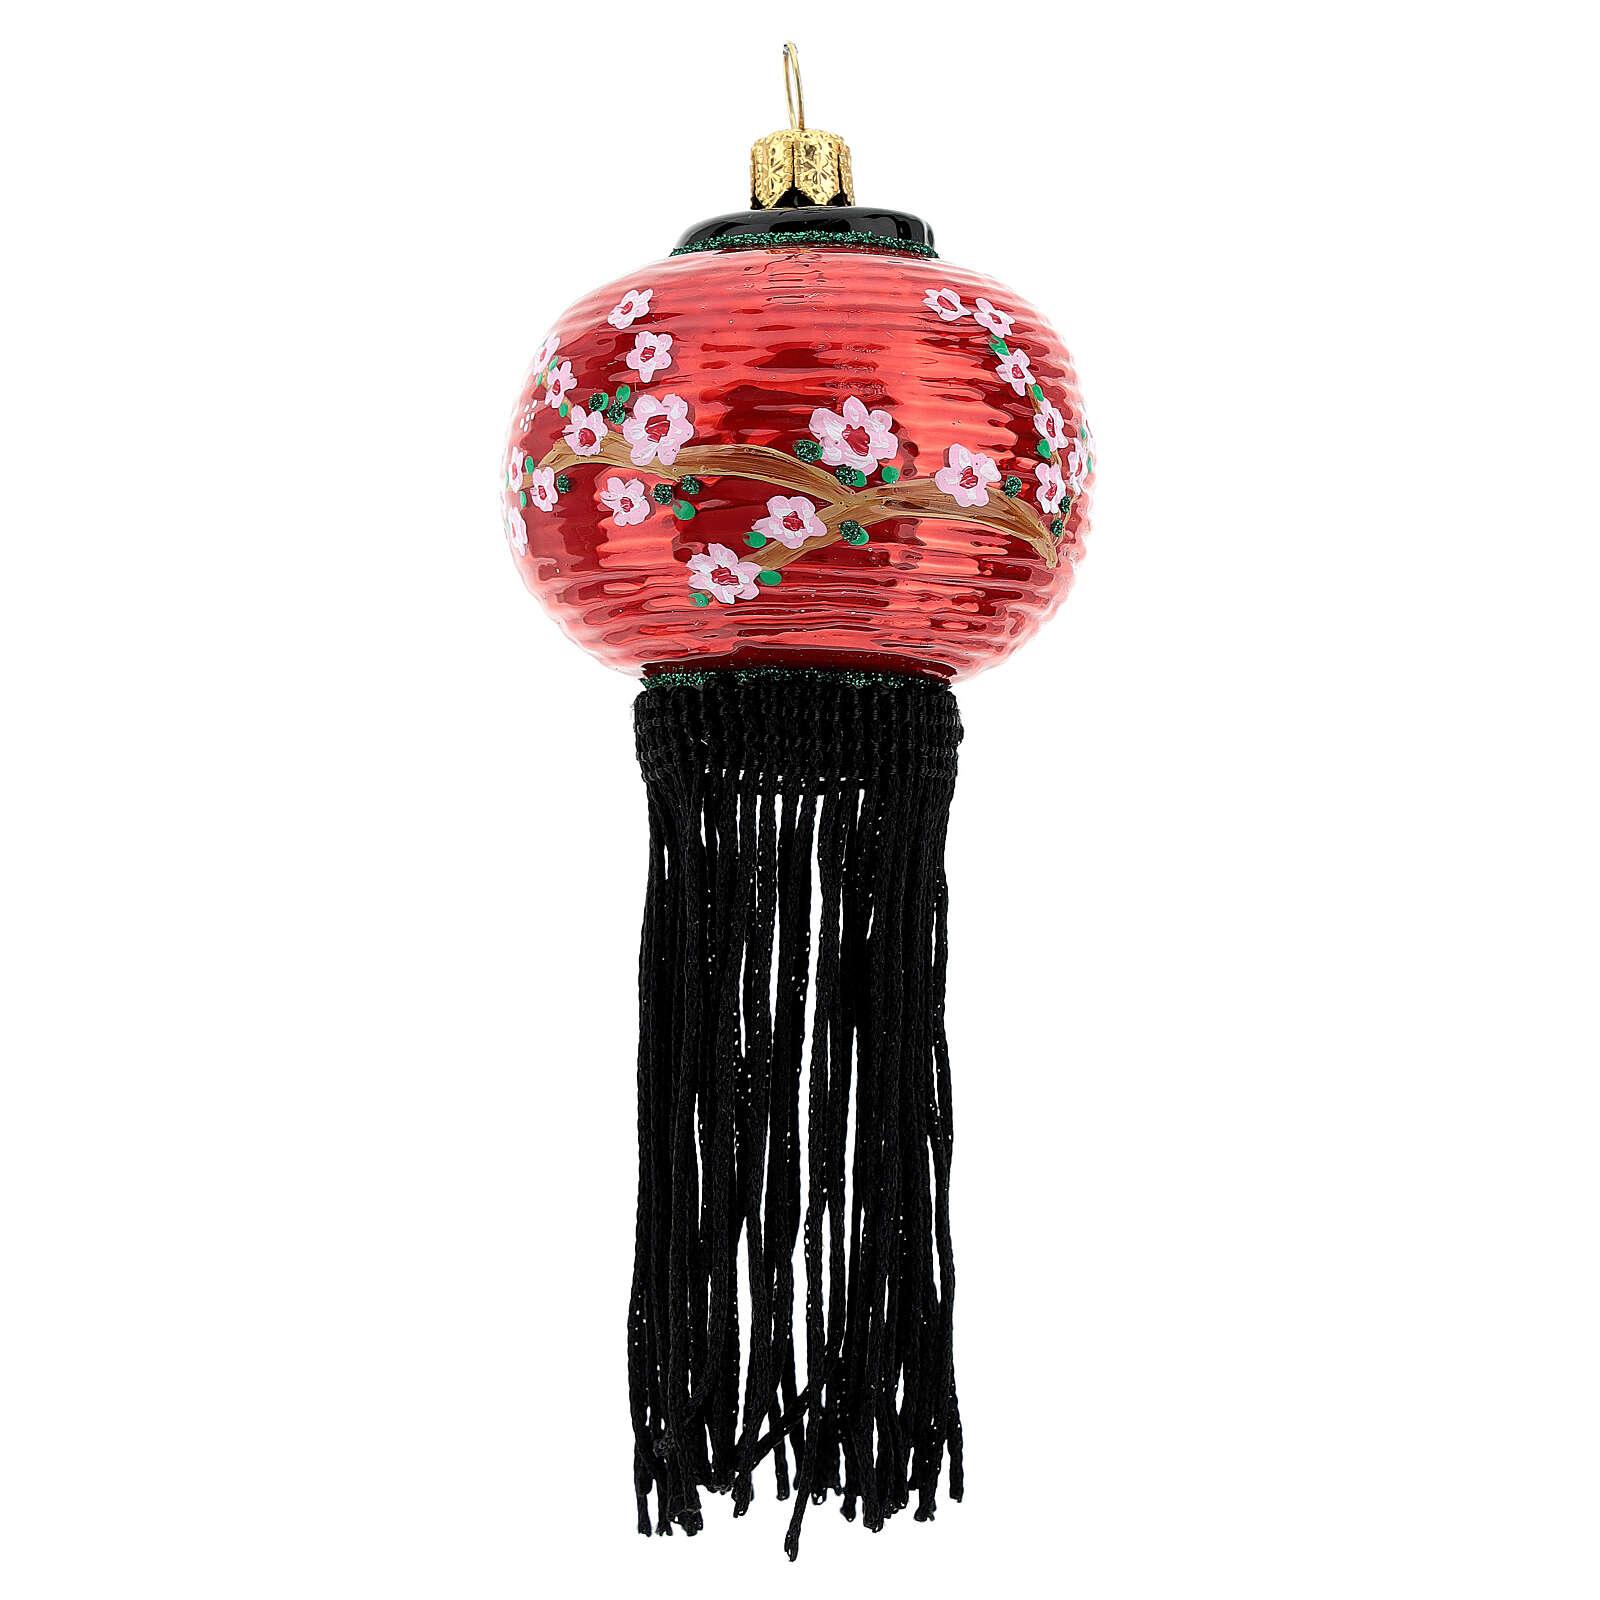 Blown glass Christmas ornament, Chinese lantern 4